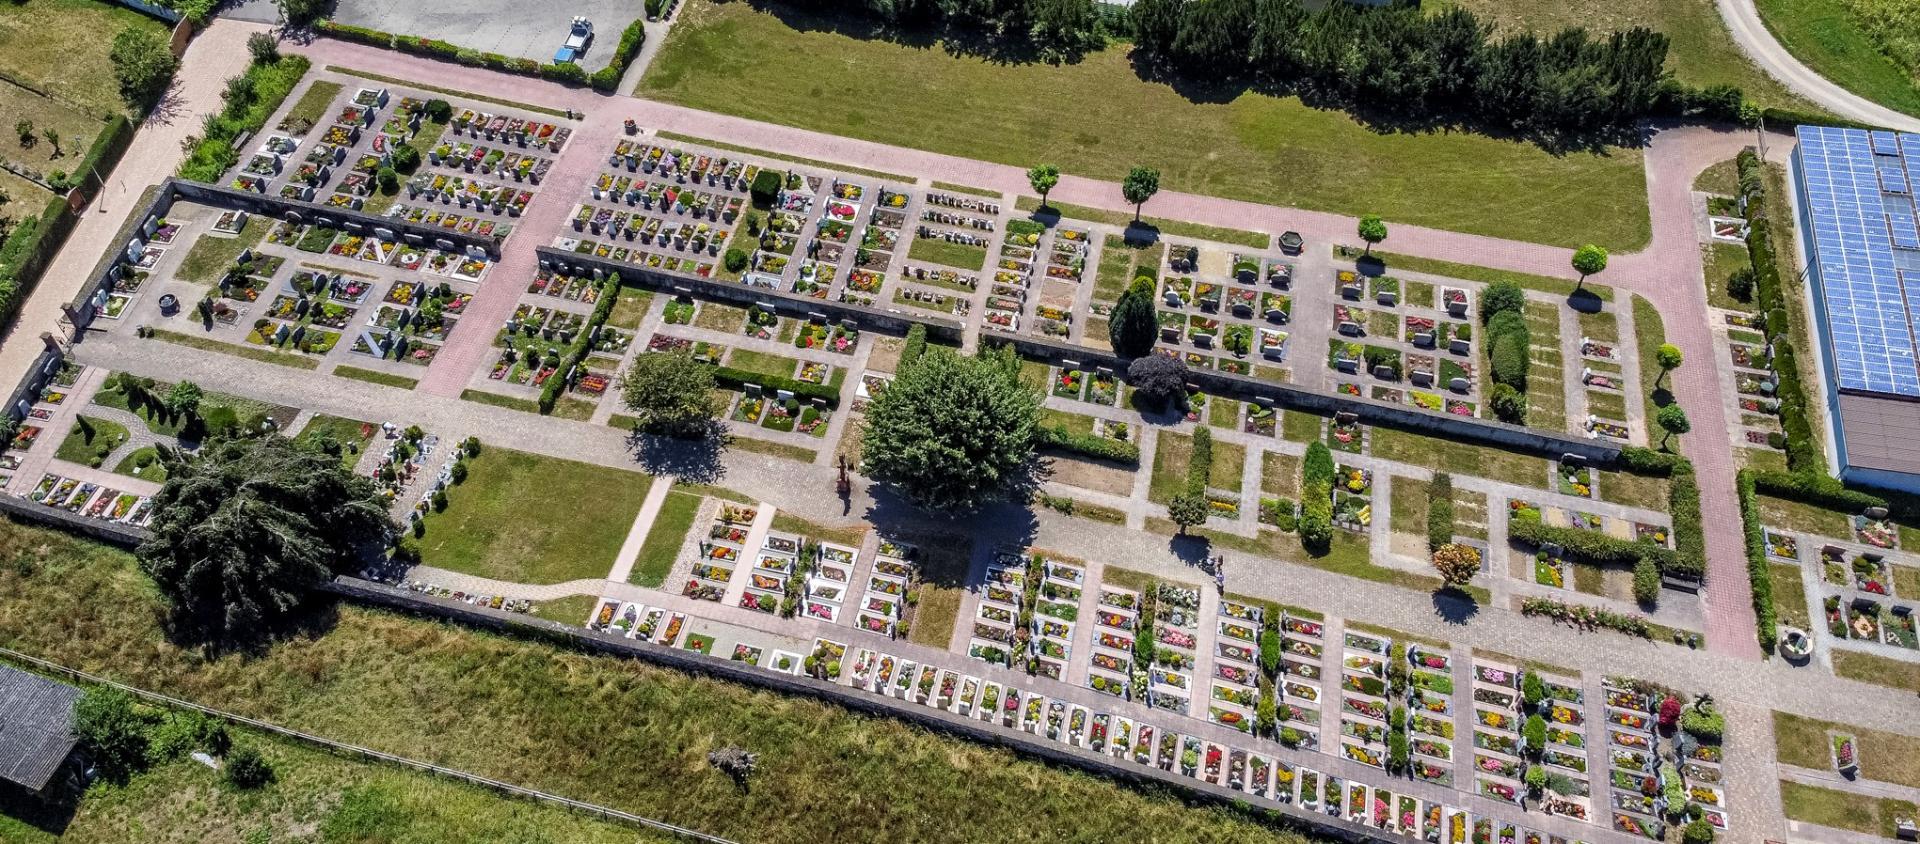 Friedhof - Luftbild